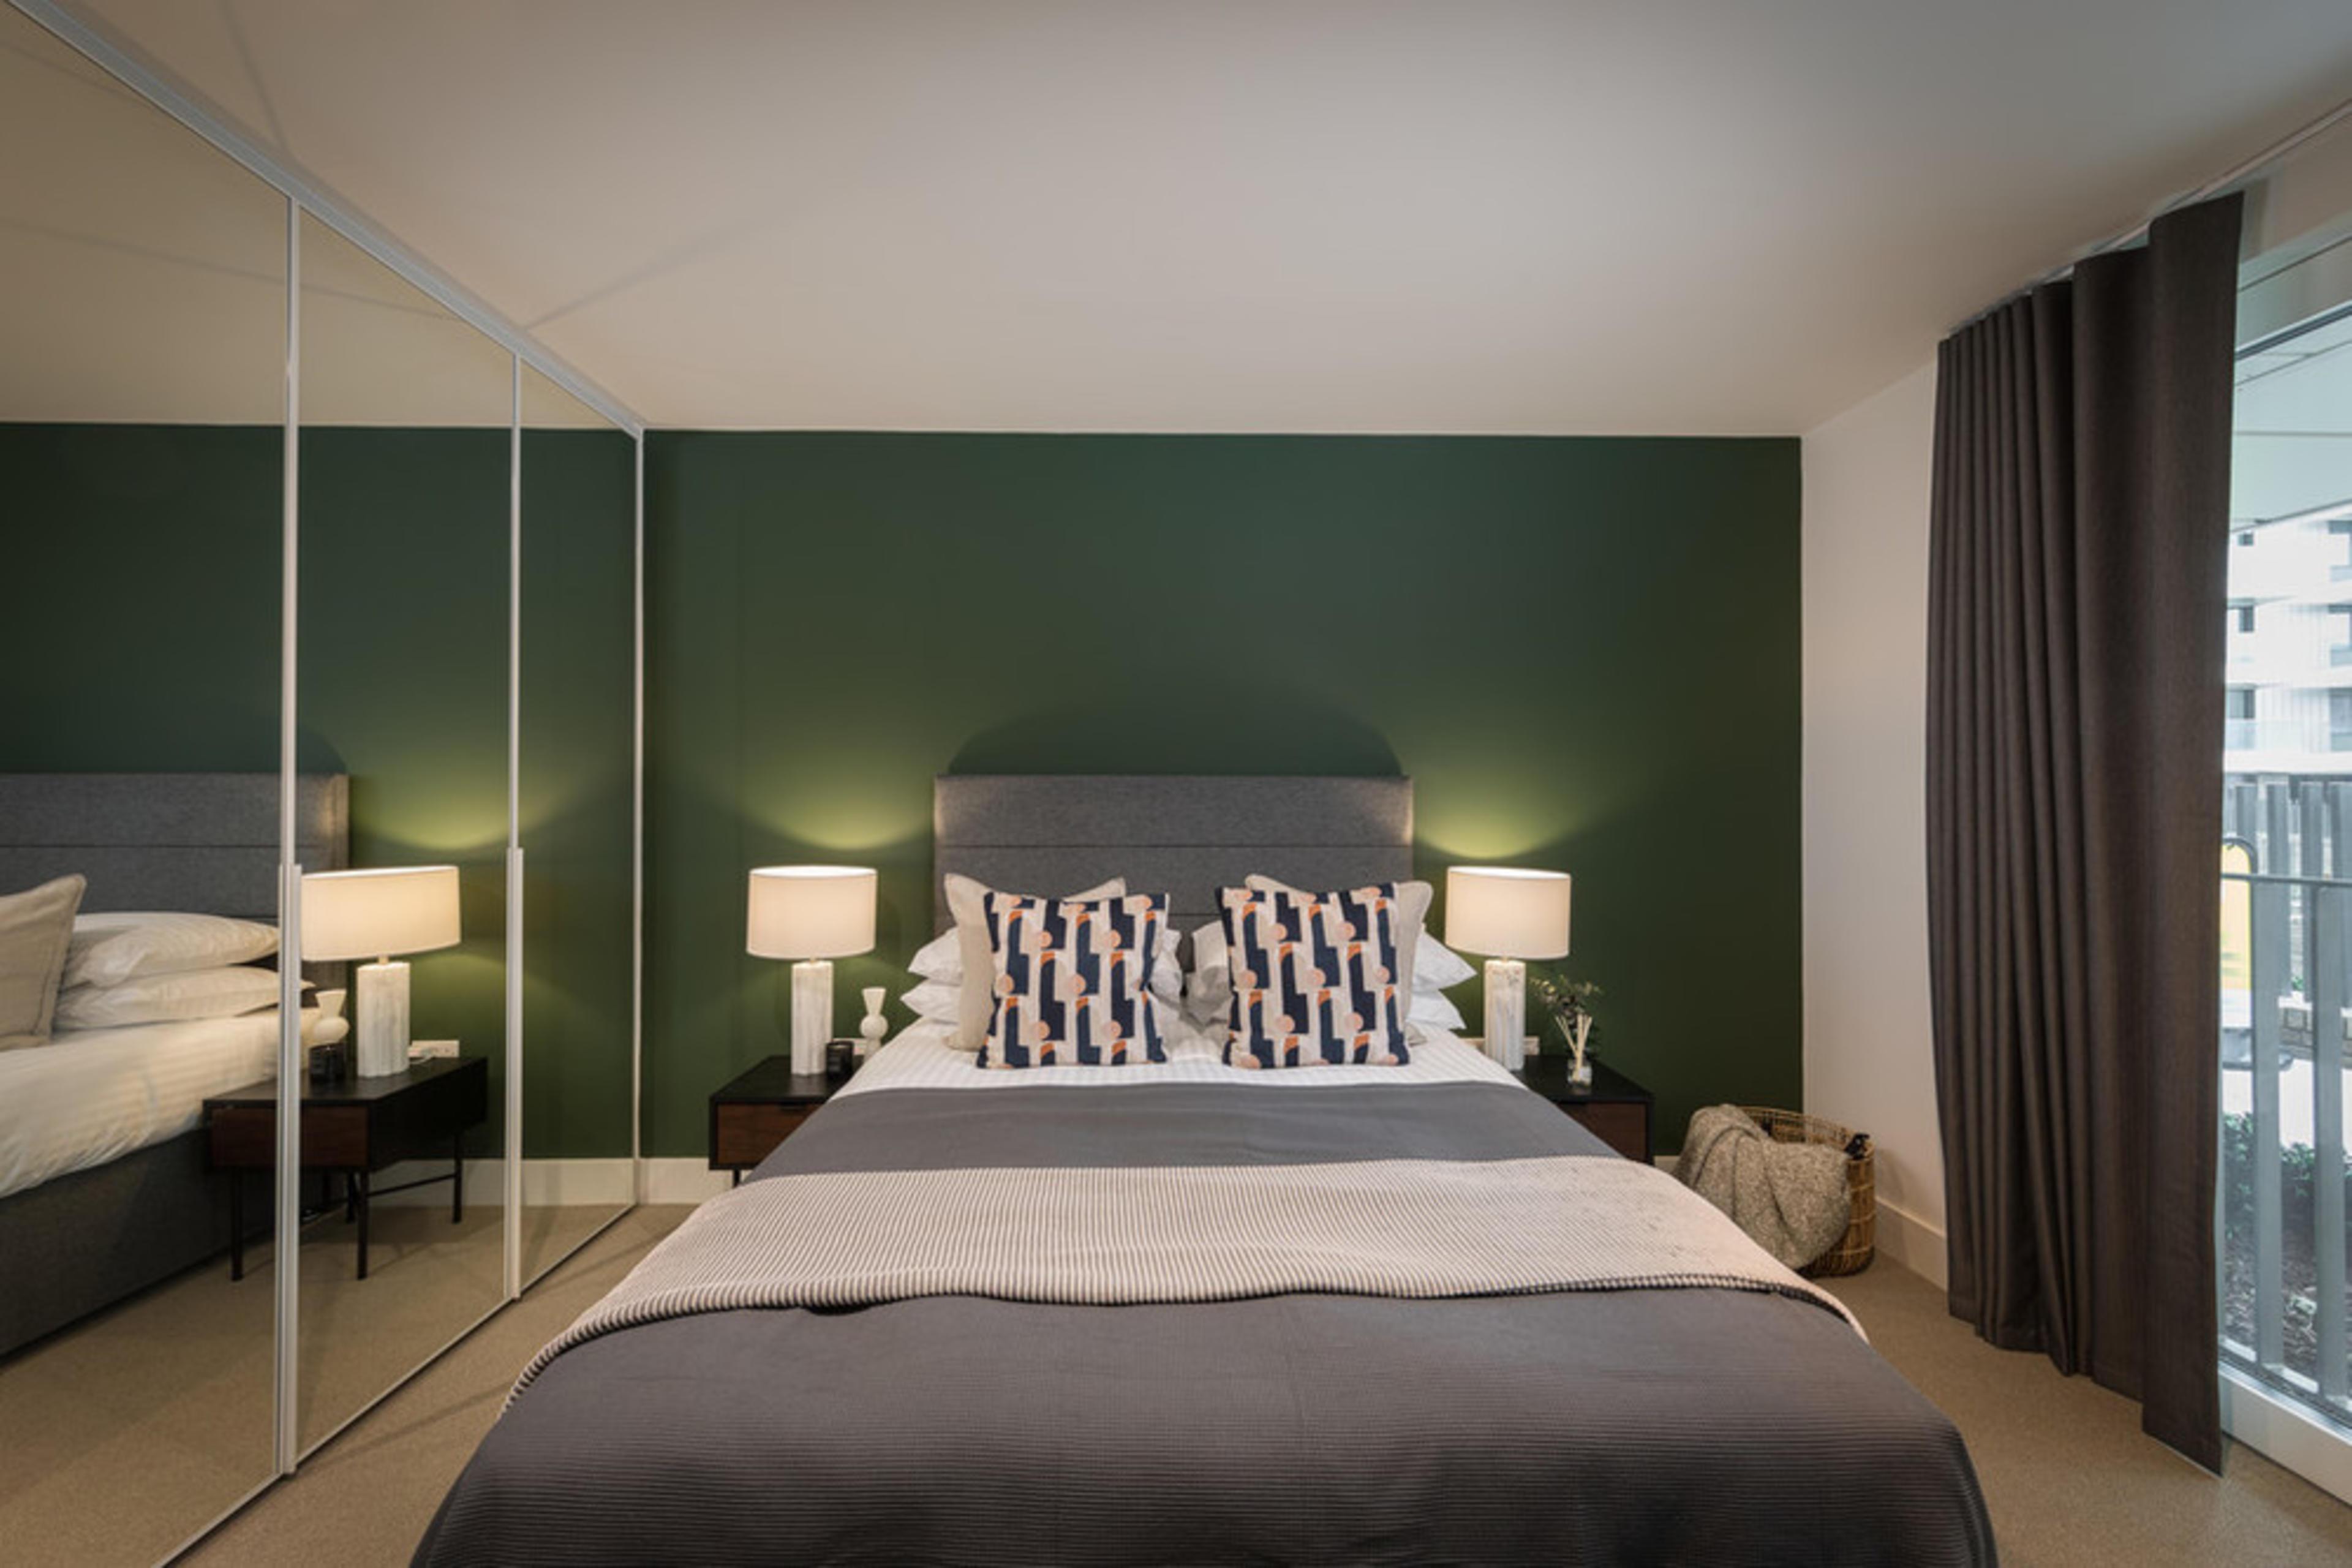 Anthology Wembley Parade - Green Bedroom 3